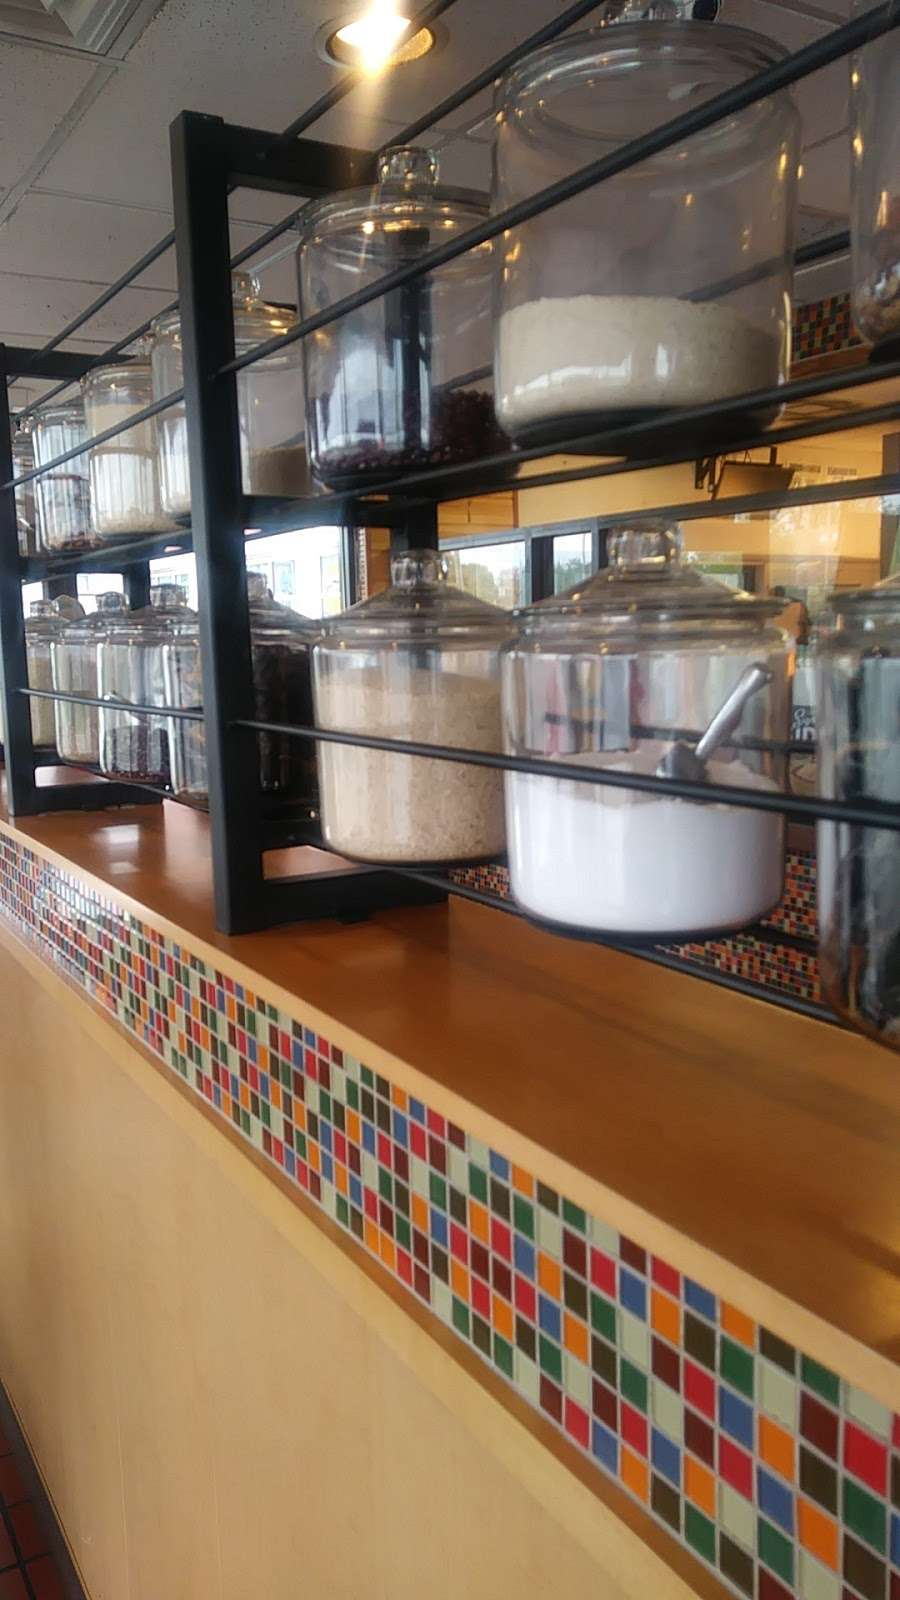 Popeyes Louisiana Kitchen - restaurant  | Photo 10 of 10 | Address: 9516 S Vincennes Ave, Chicago, IL 60643, USA | Phone: (773) 238-7875